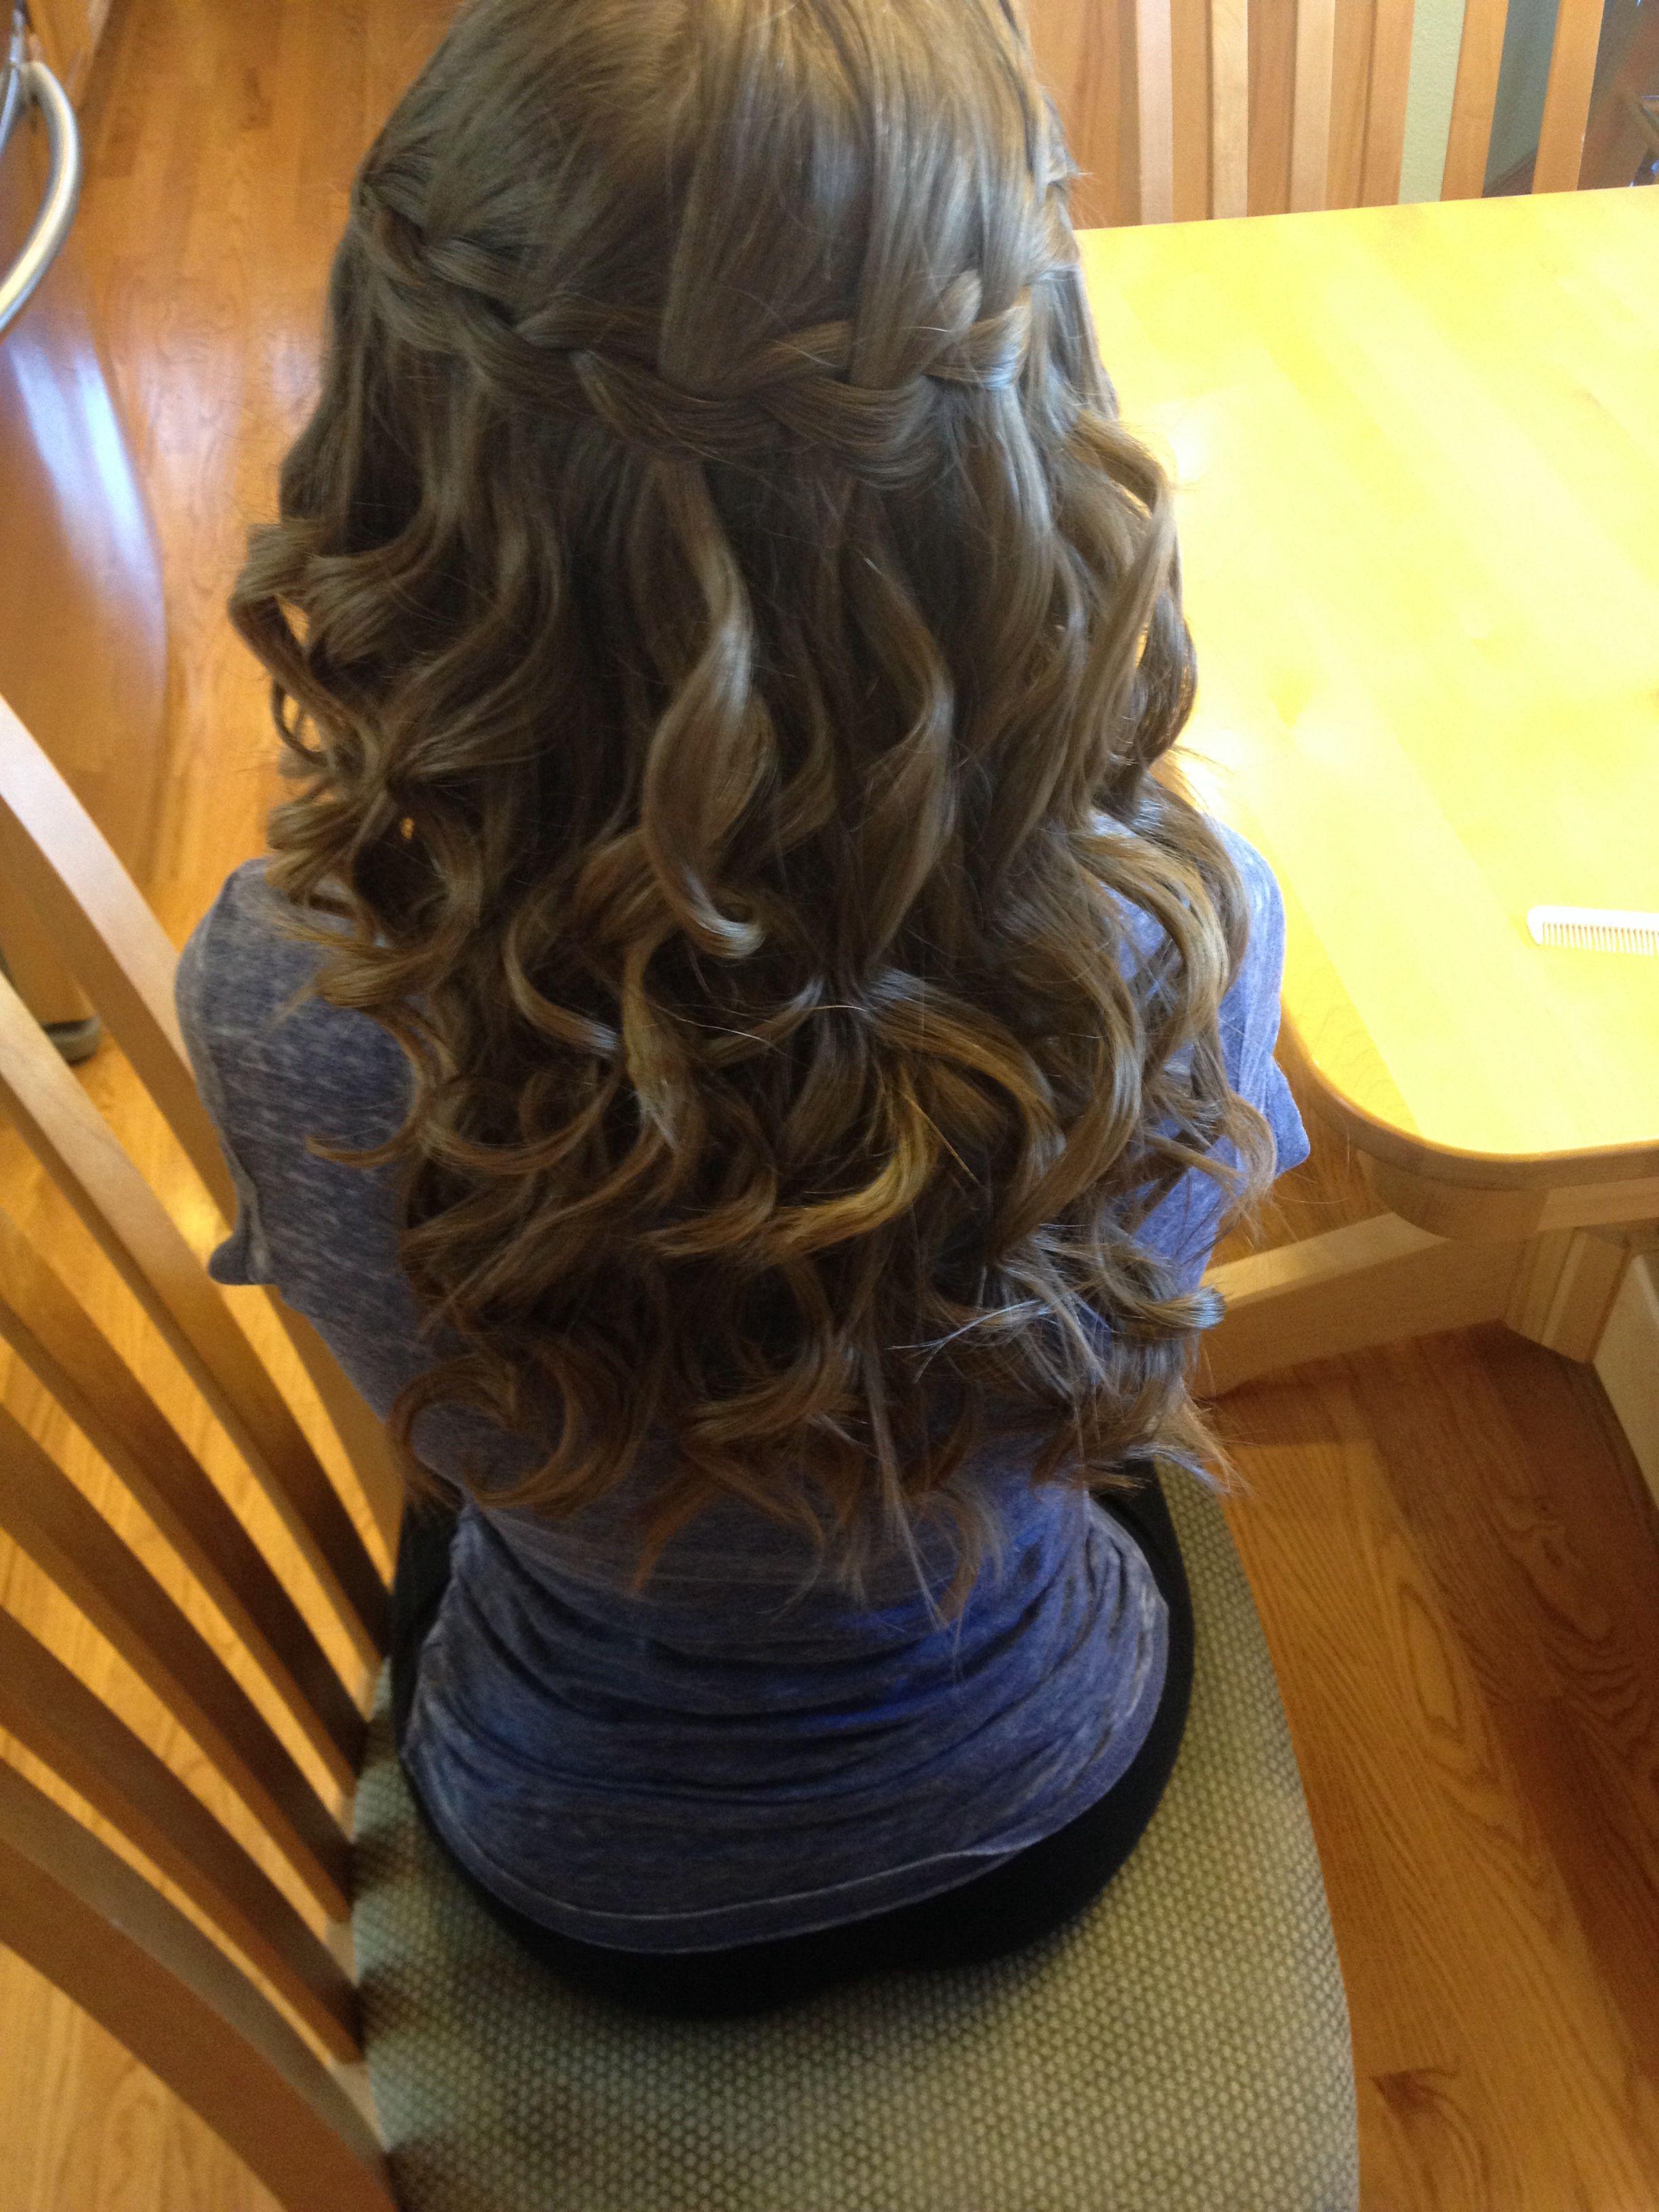 Waterfall braid with loose curls (: | Hair